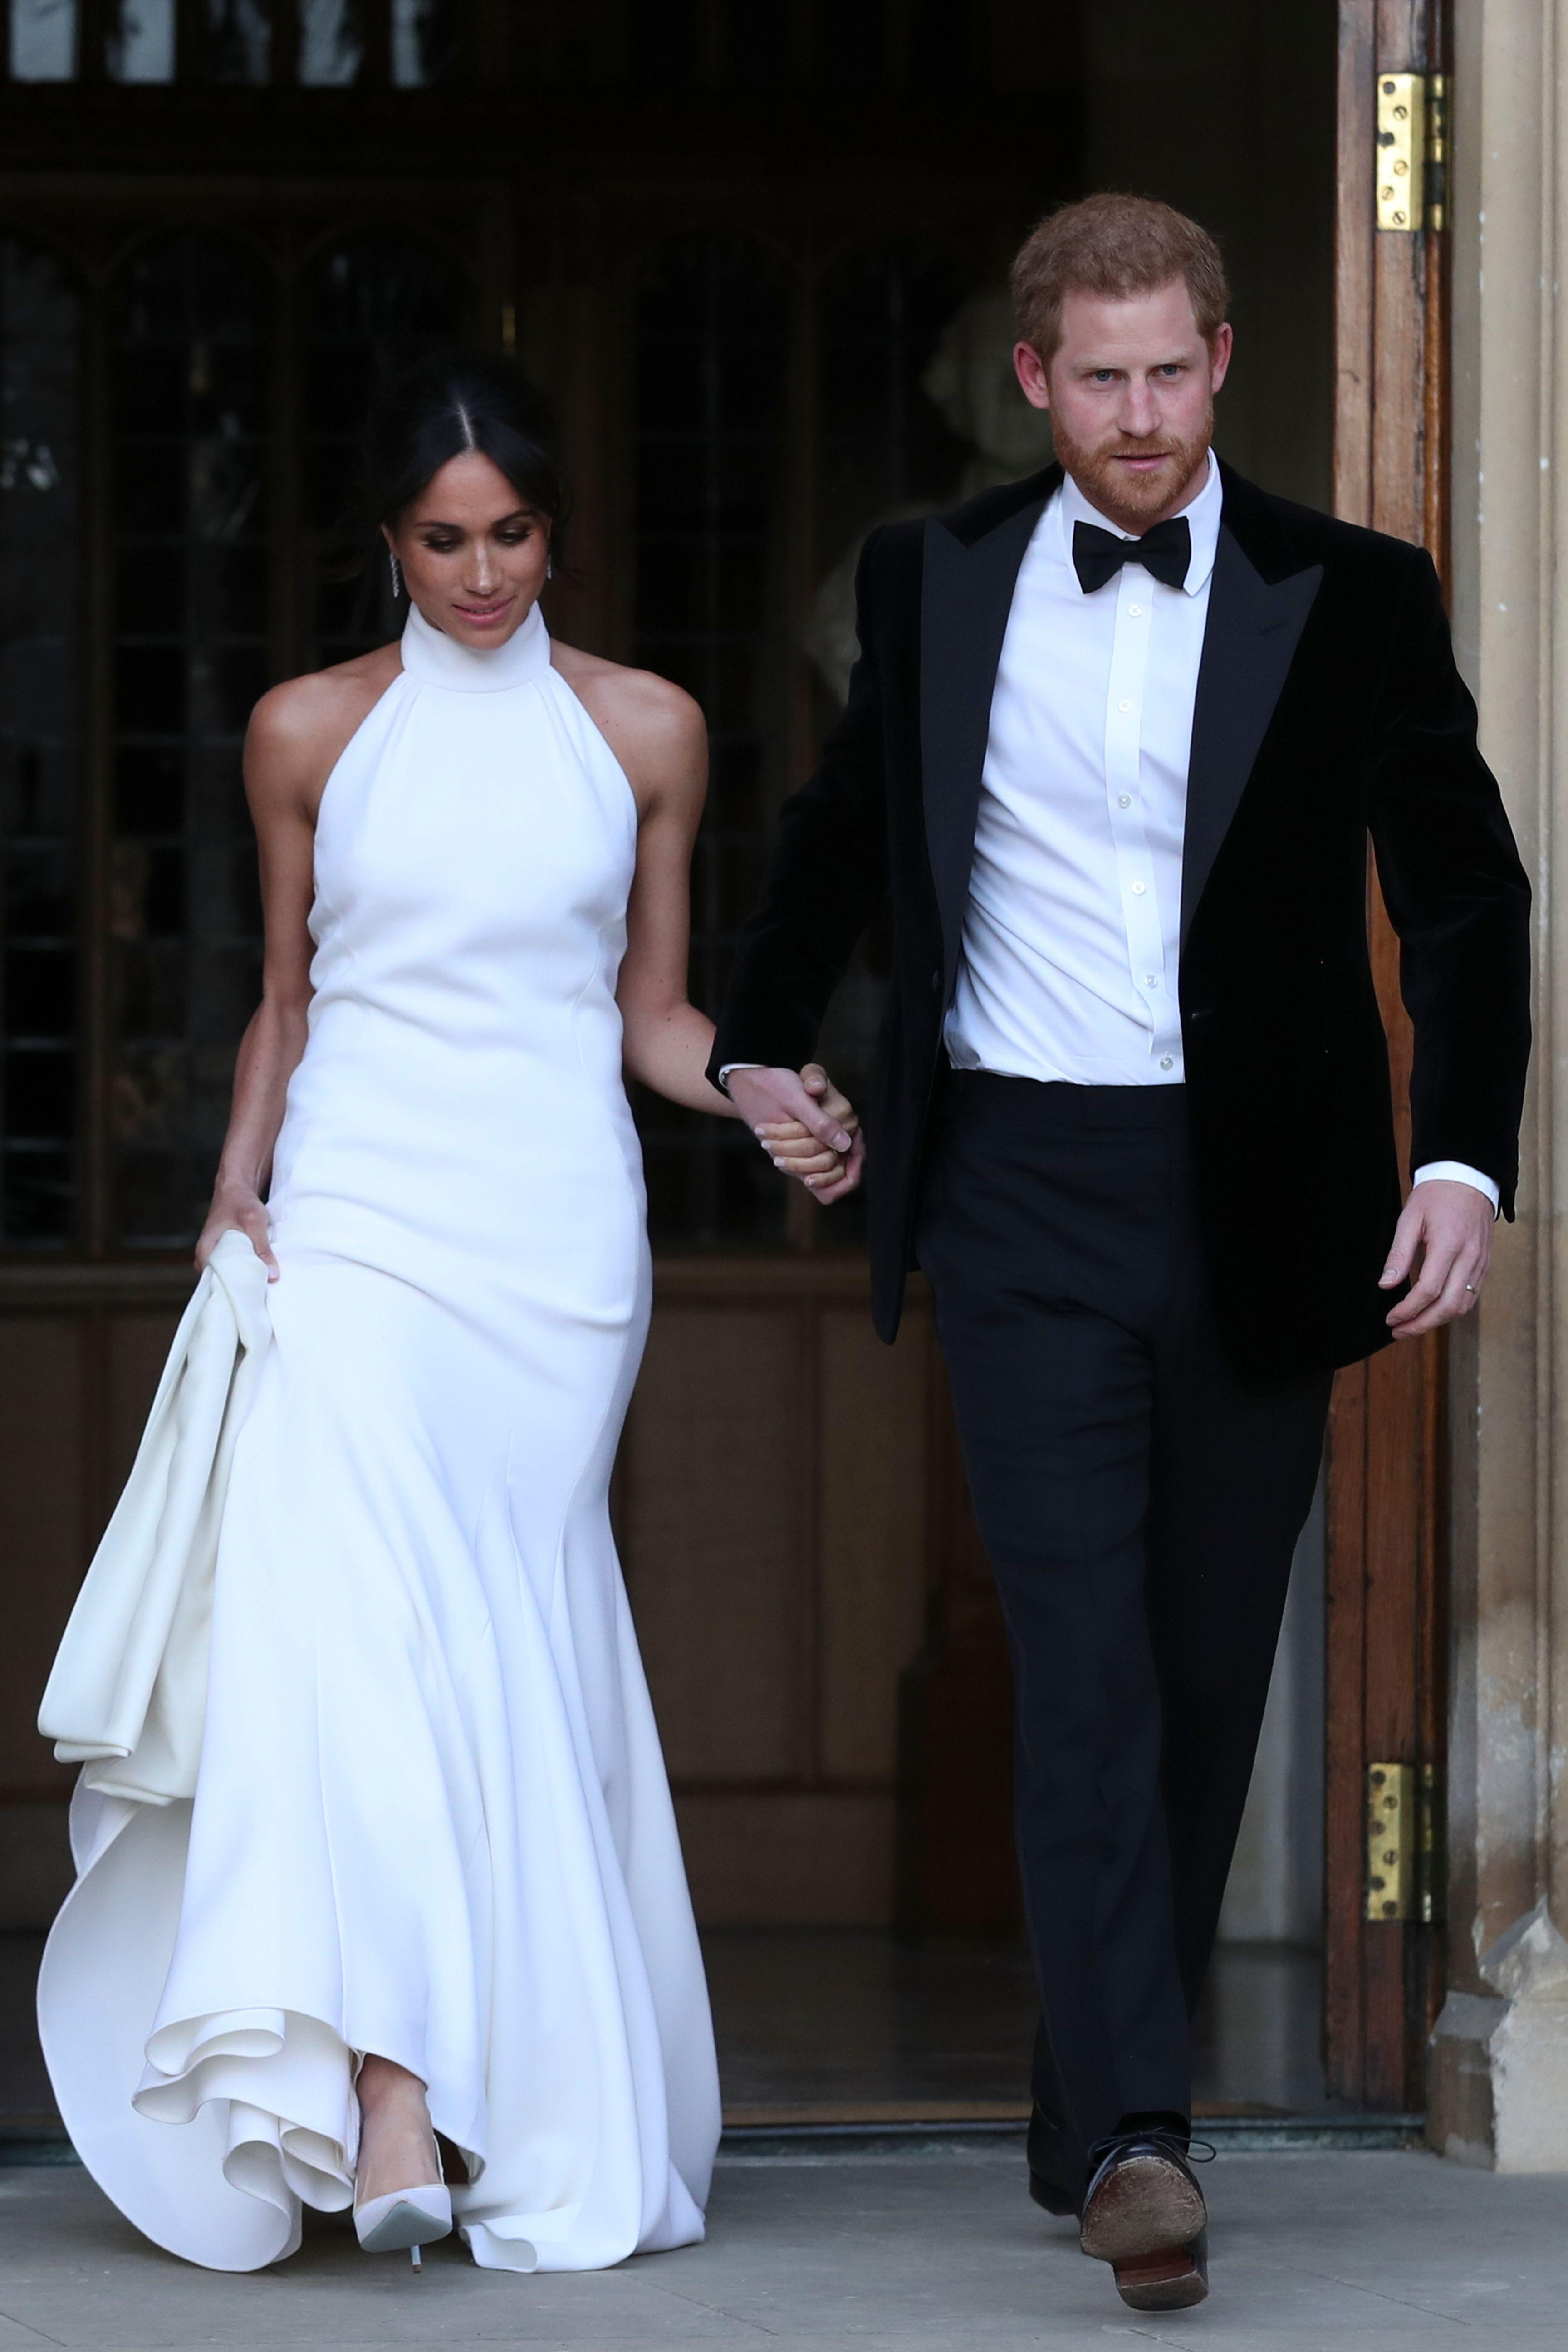 Meghan Markle Second Wedding Dress Photos - Meghan Markle ...